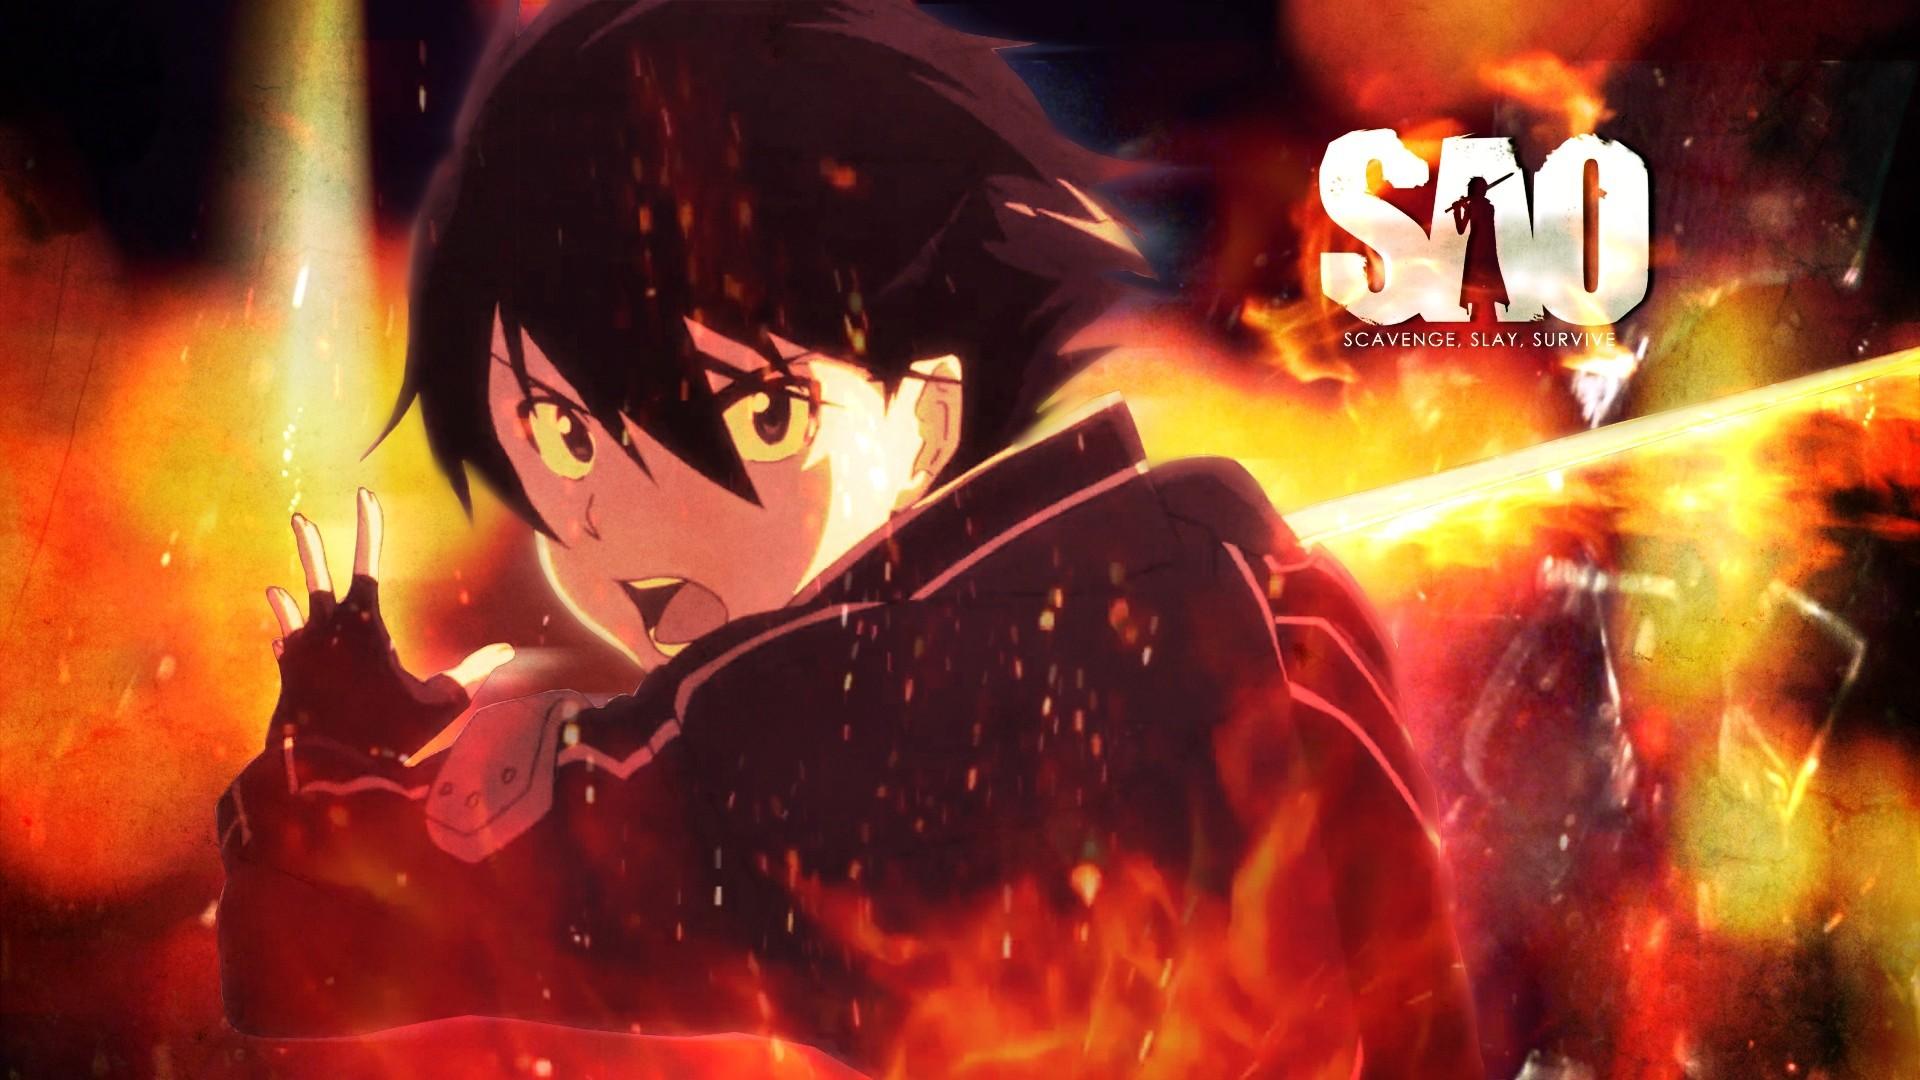 Sword Art Online fans images sword art online HD wallpaper and background  photos